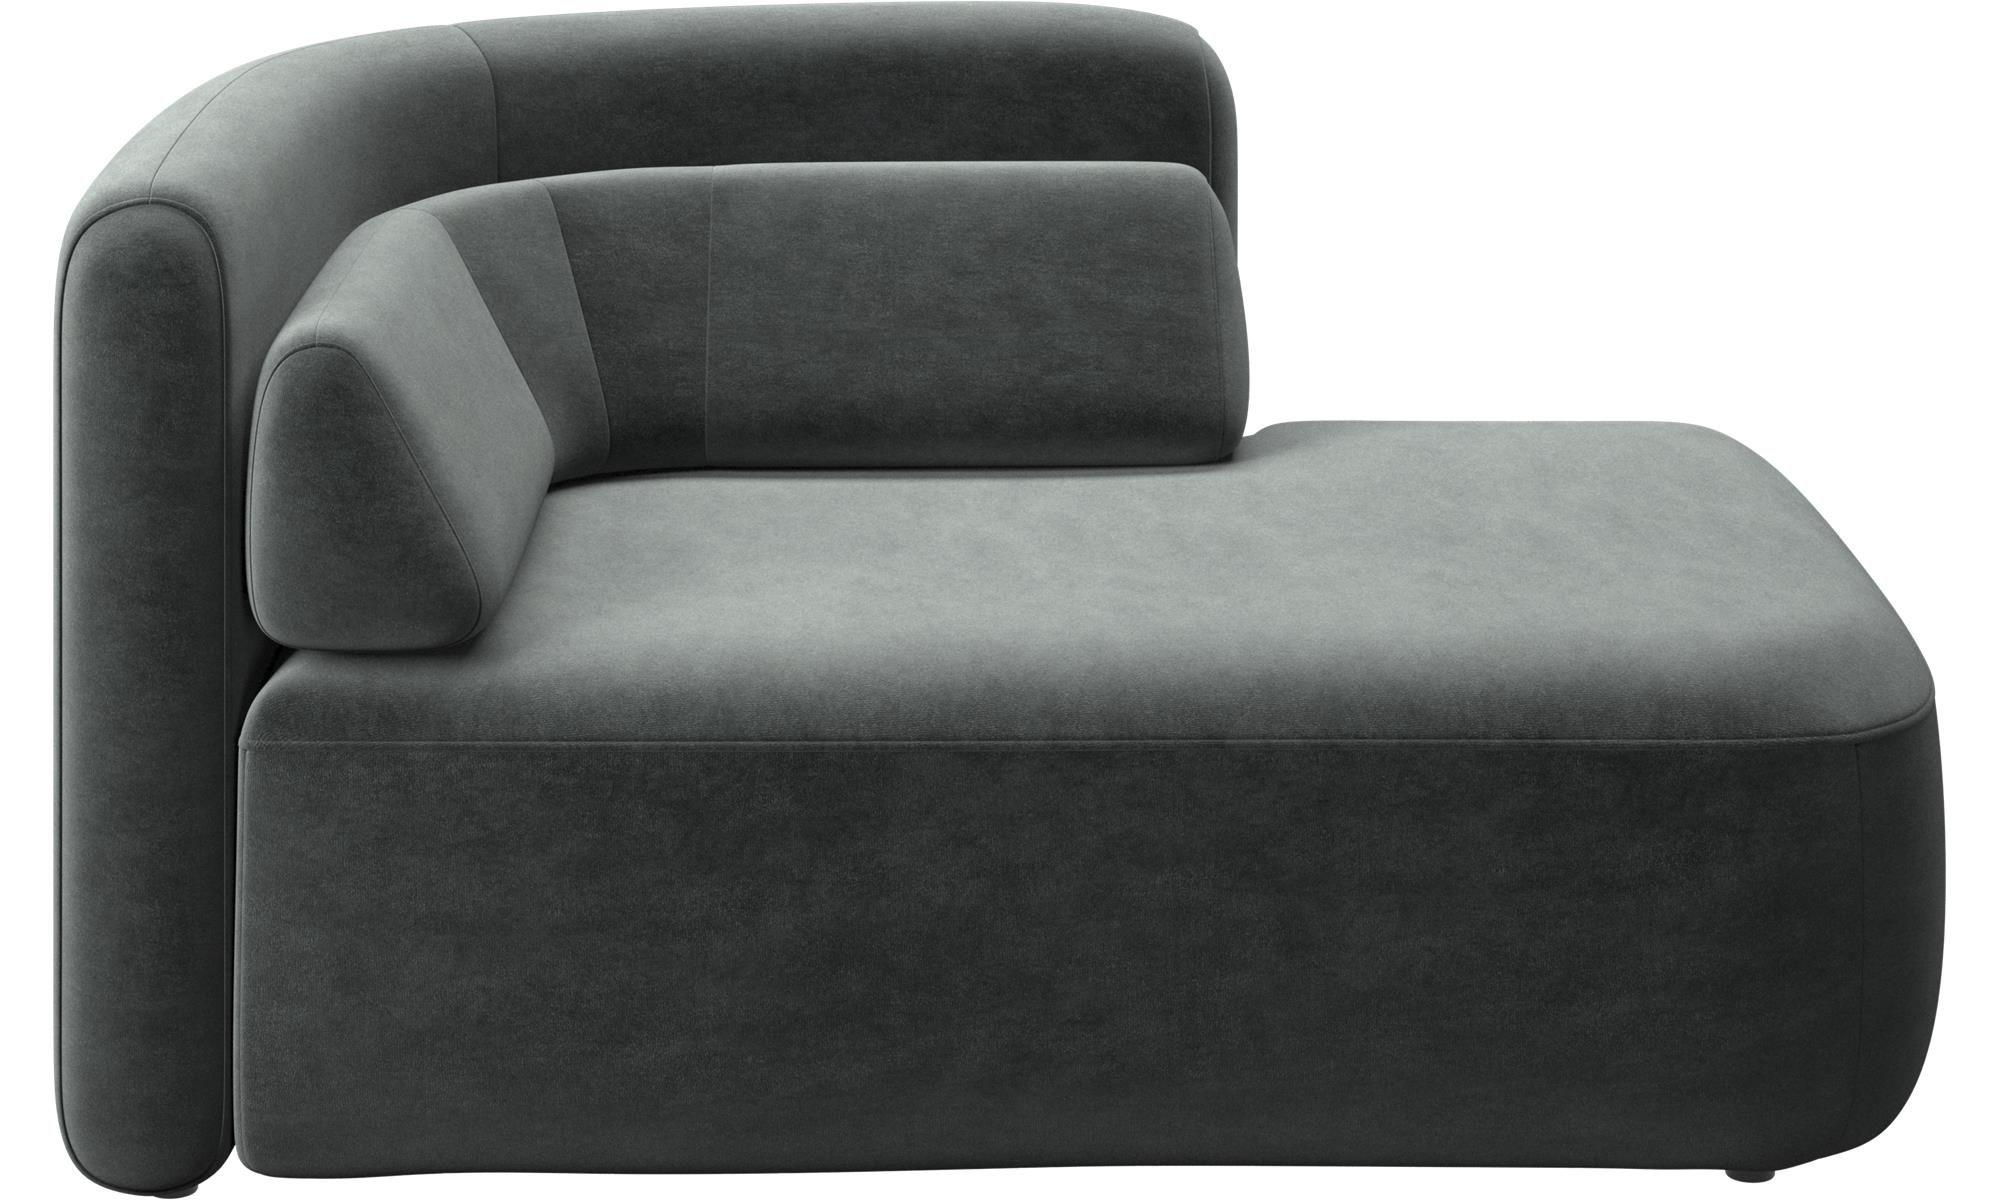 Ottawa 1 5 Seater Open End Right Side Modular Sofa Boconcept Modern Modular Sofas